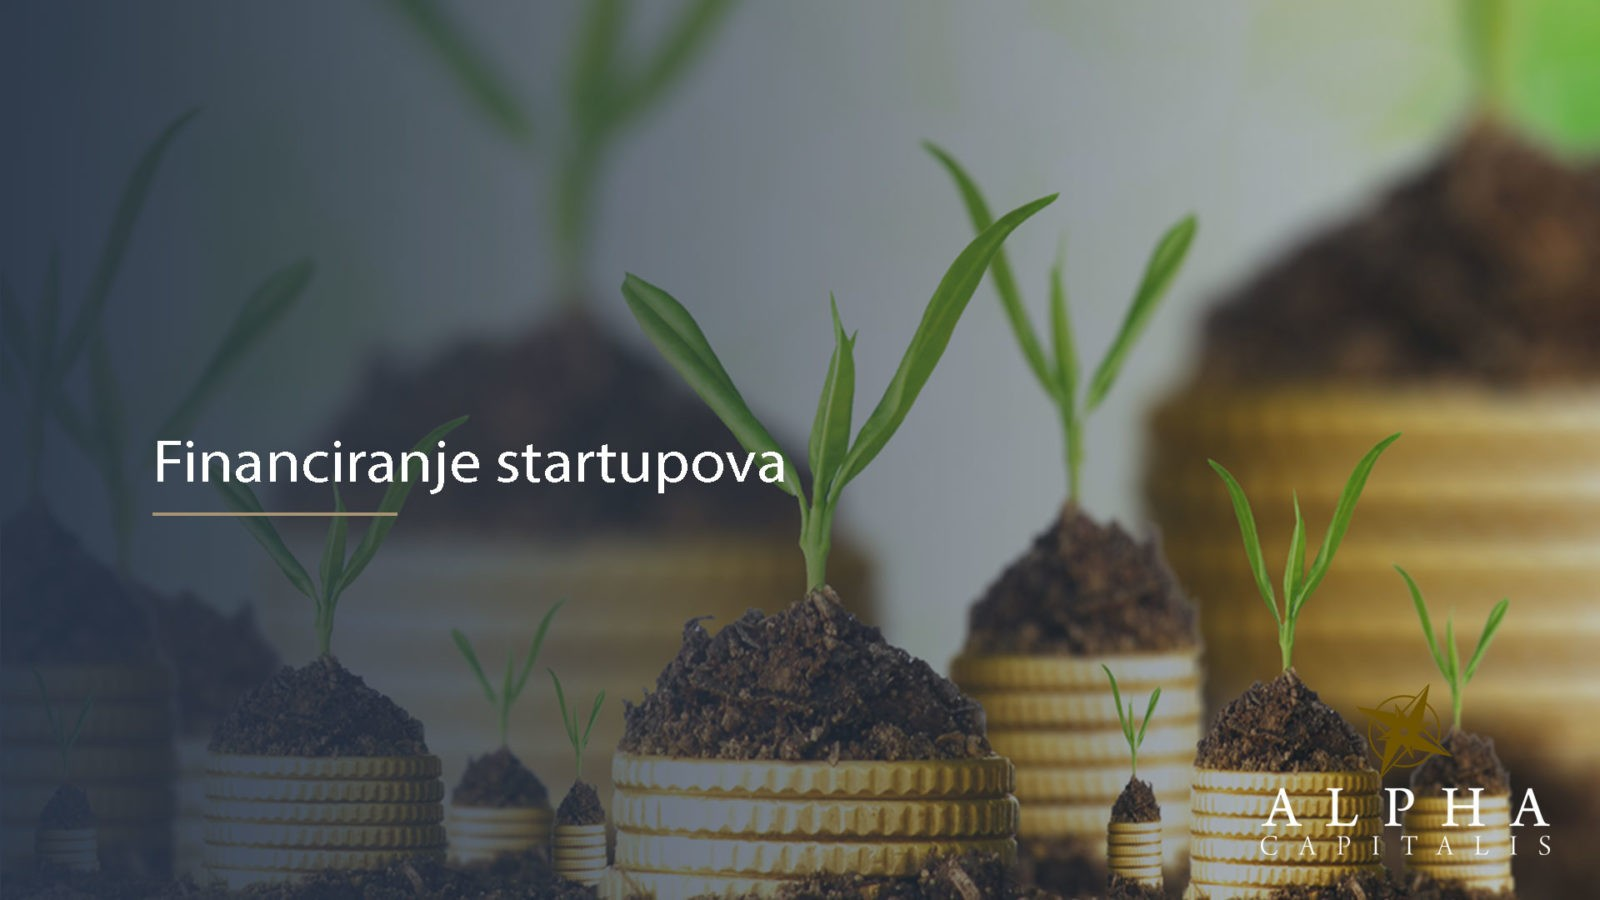 Financiranje startupova 2019 04 11 - Financiranje startupova